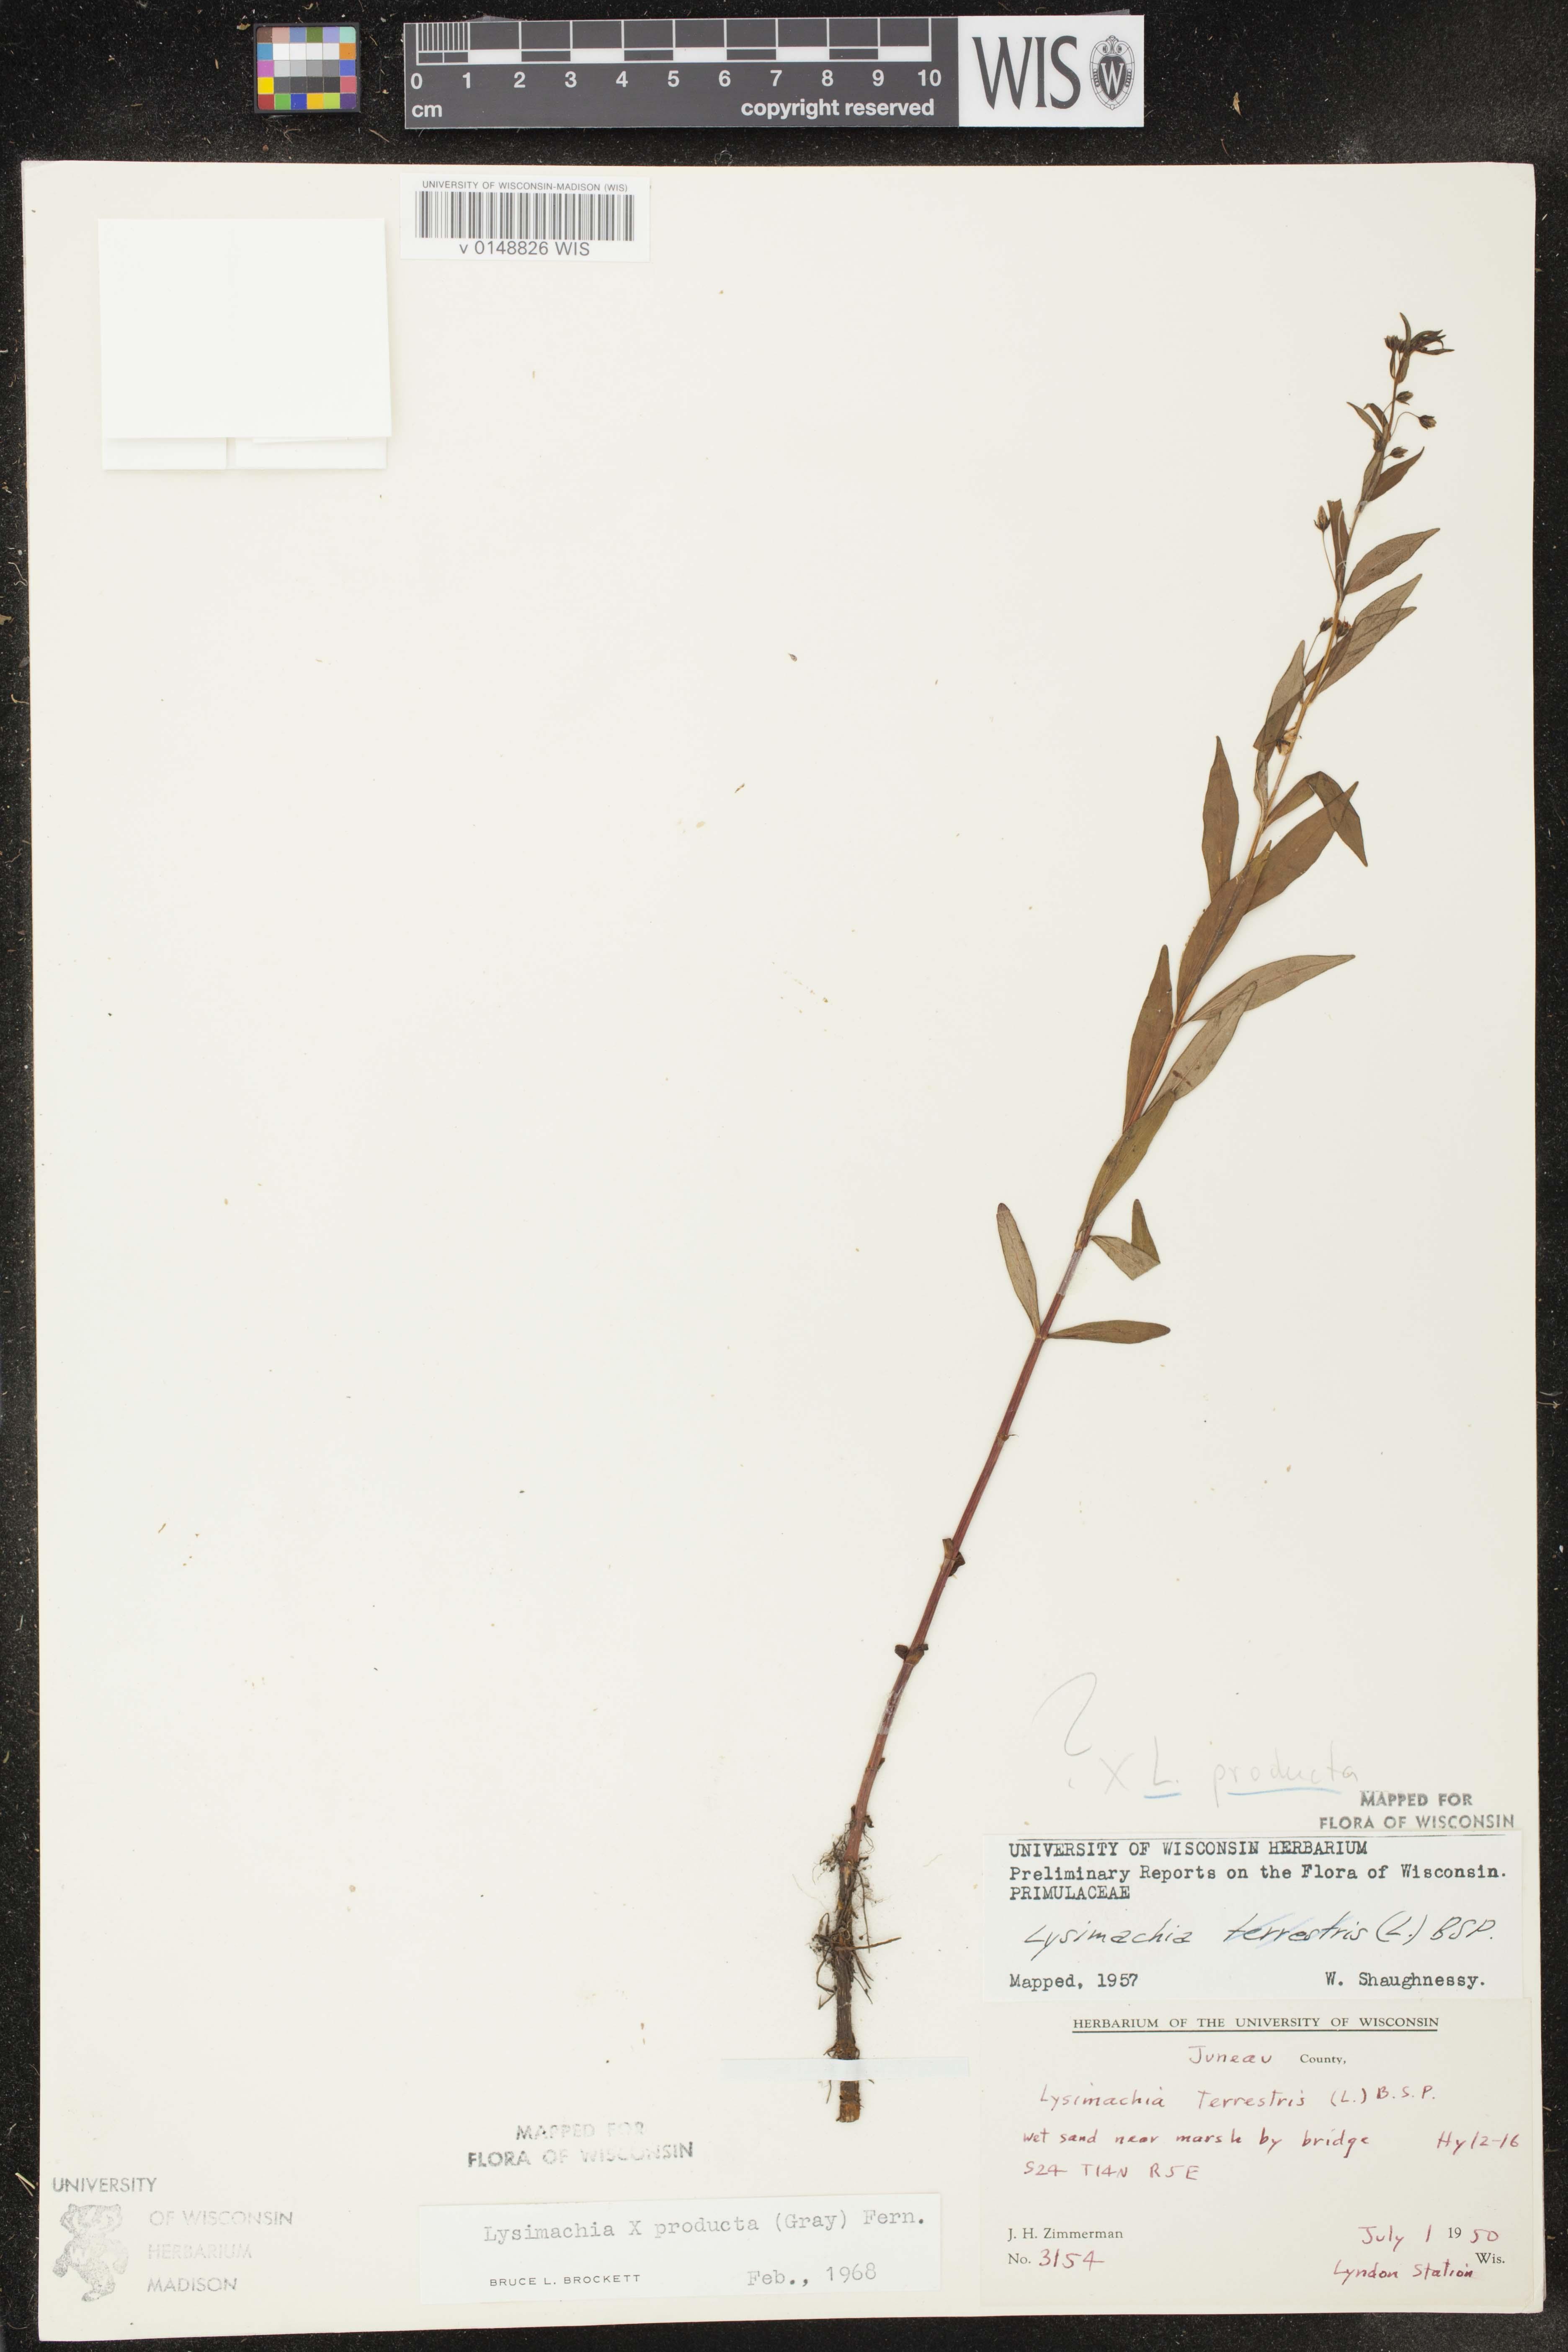 Image of Lysimachia x producta